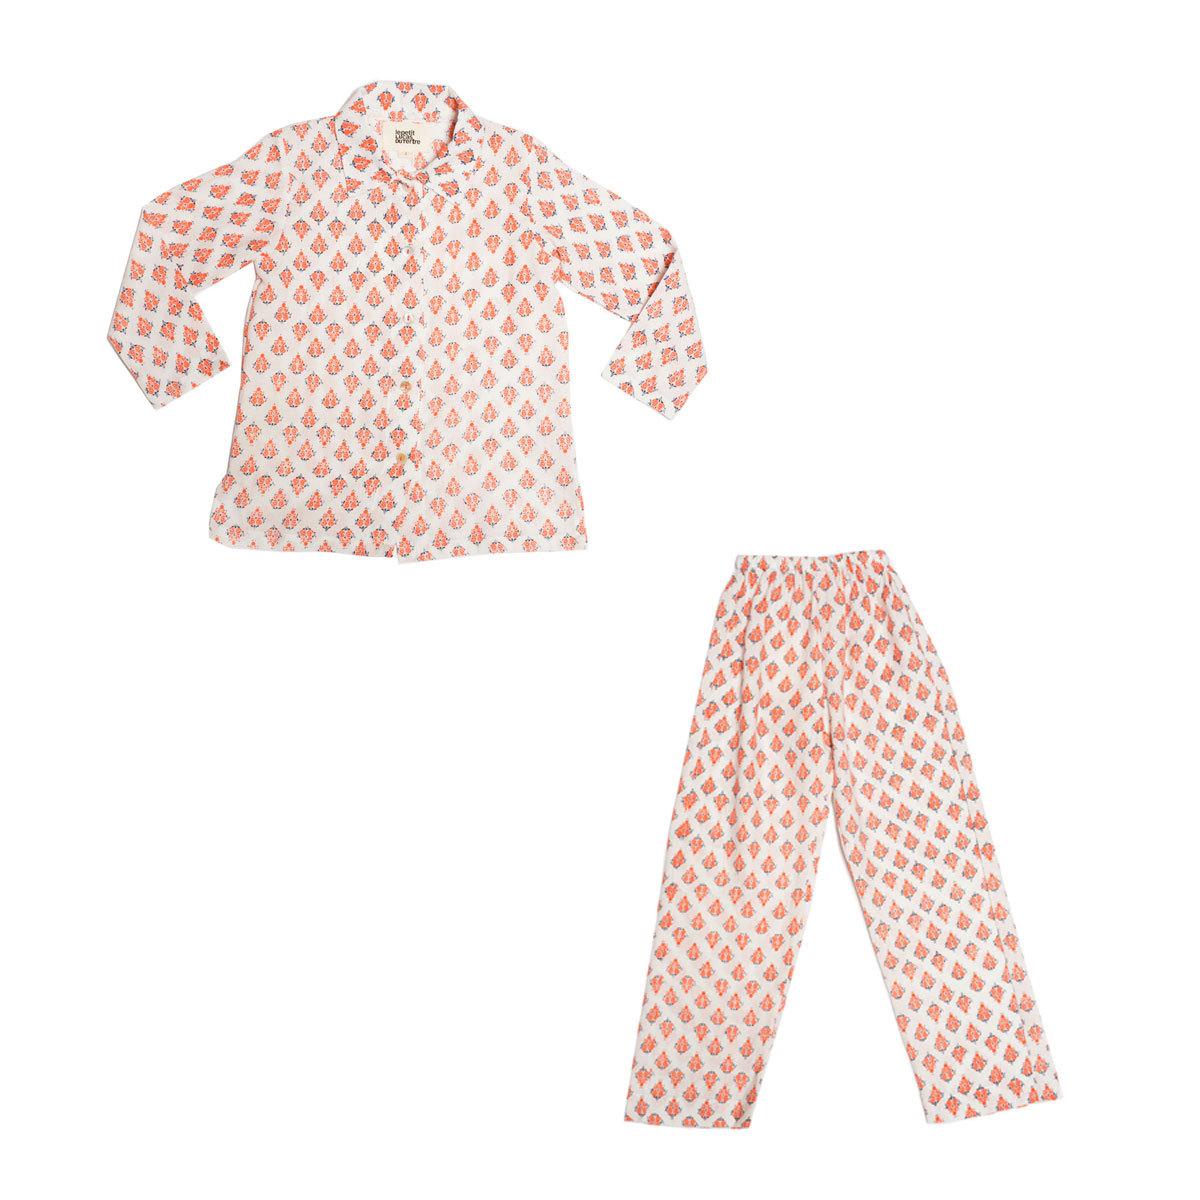 Body et Pyjama Pyjama 2 Pièces - Russian Bouti - 2 ans Pyjama 2 Pièces - Russian Bouti - 2 ans